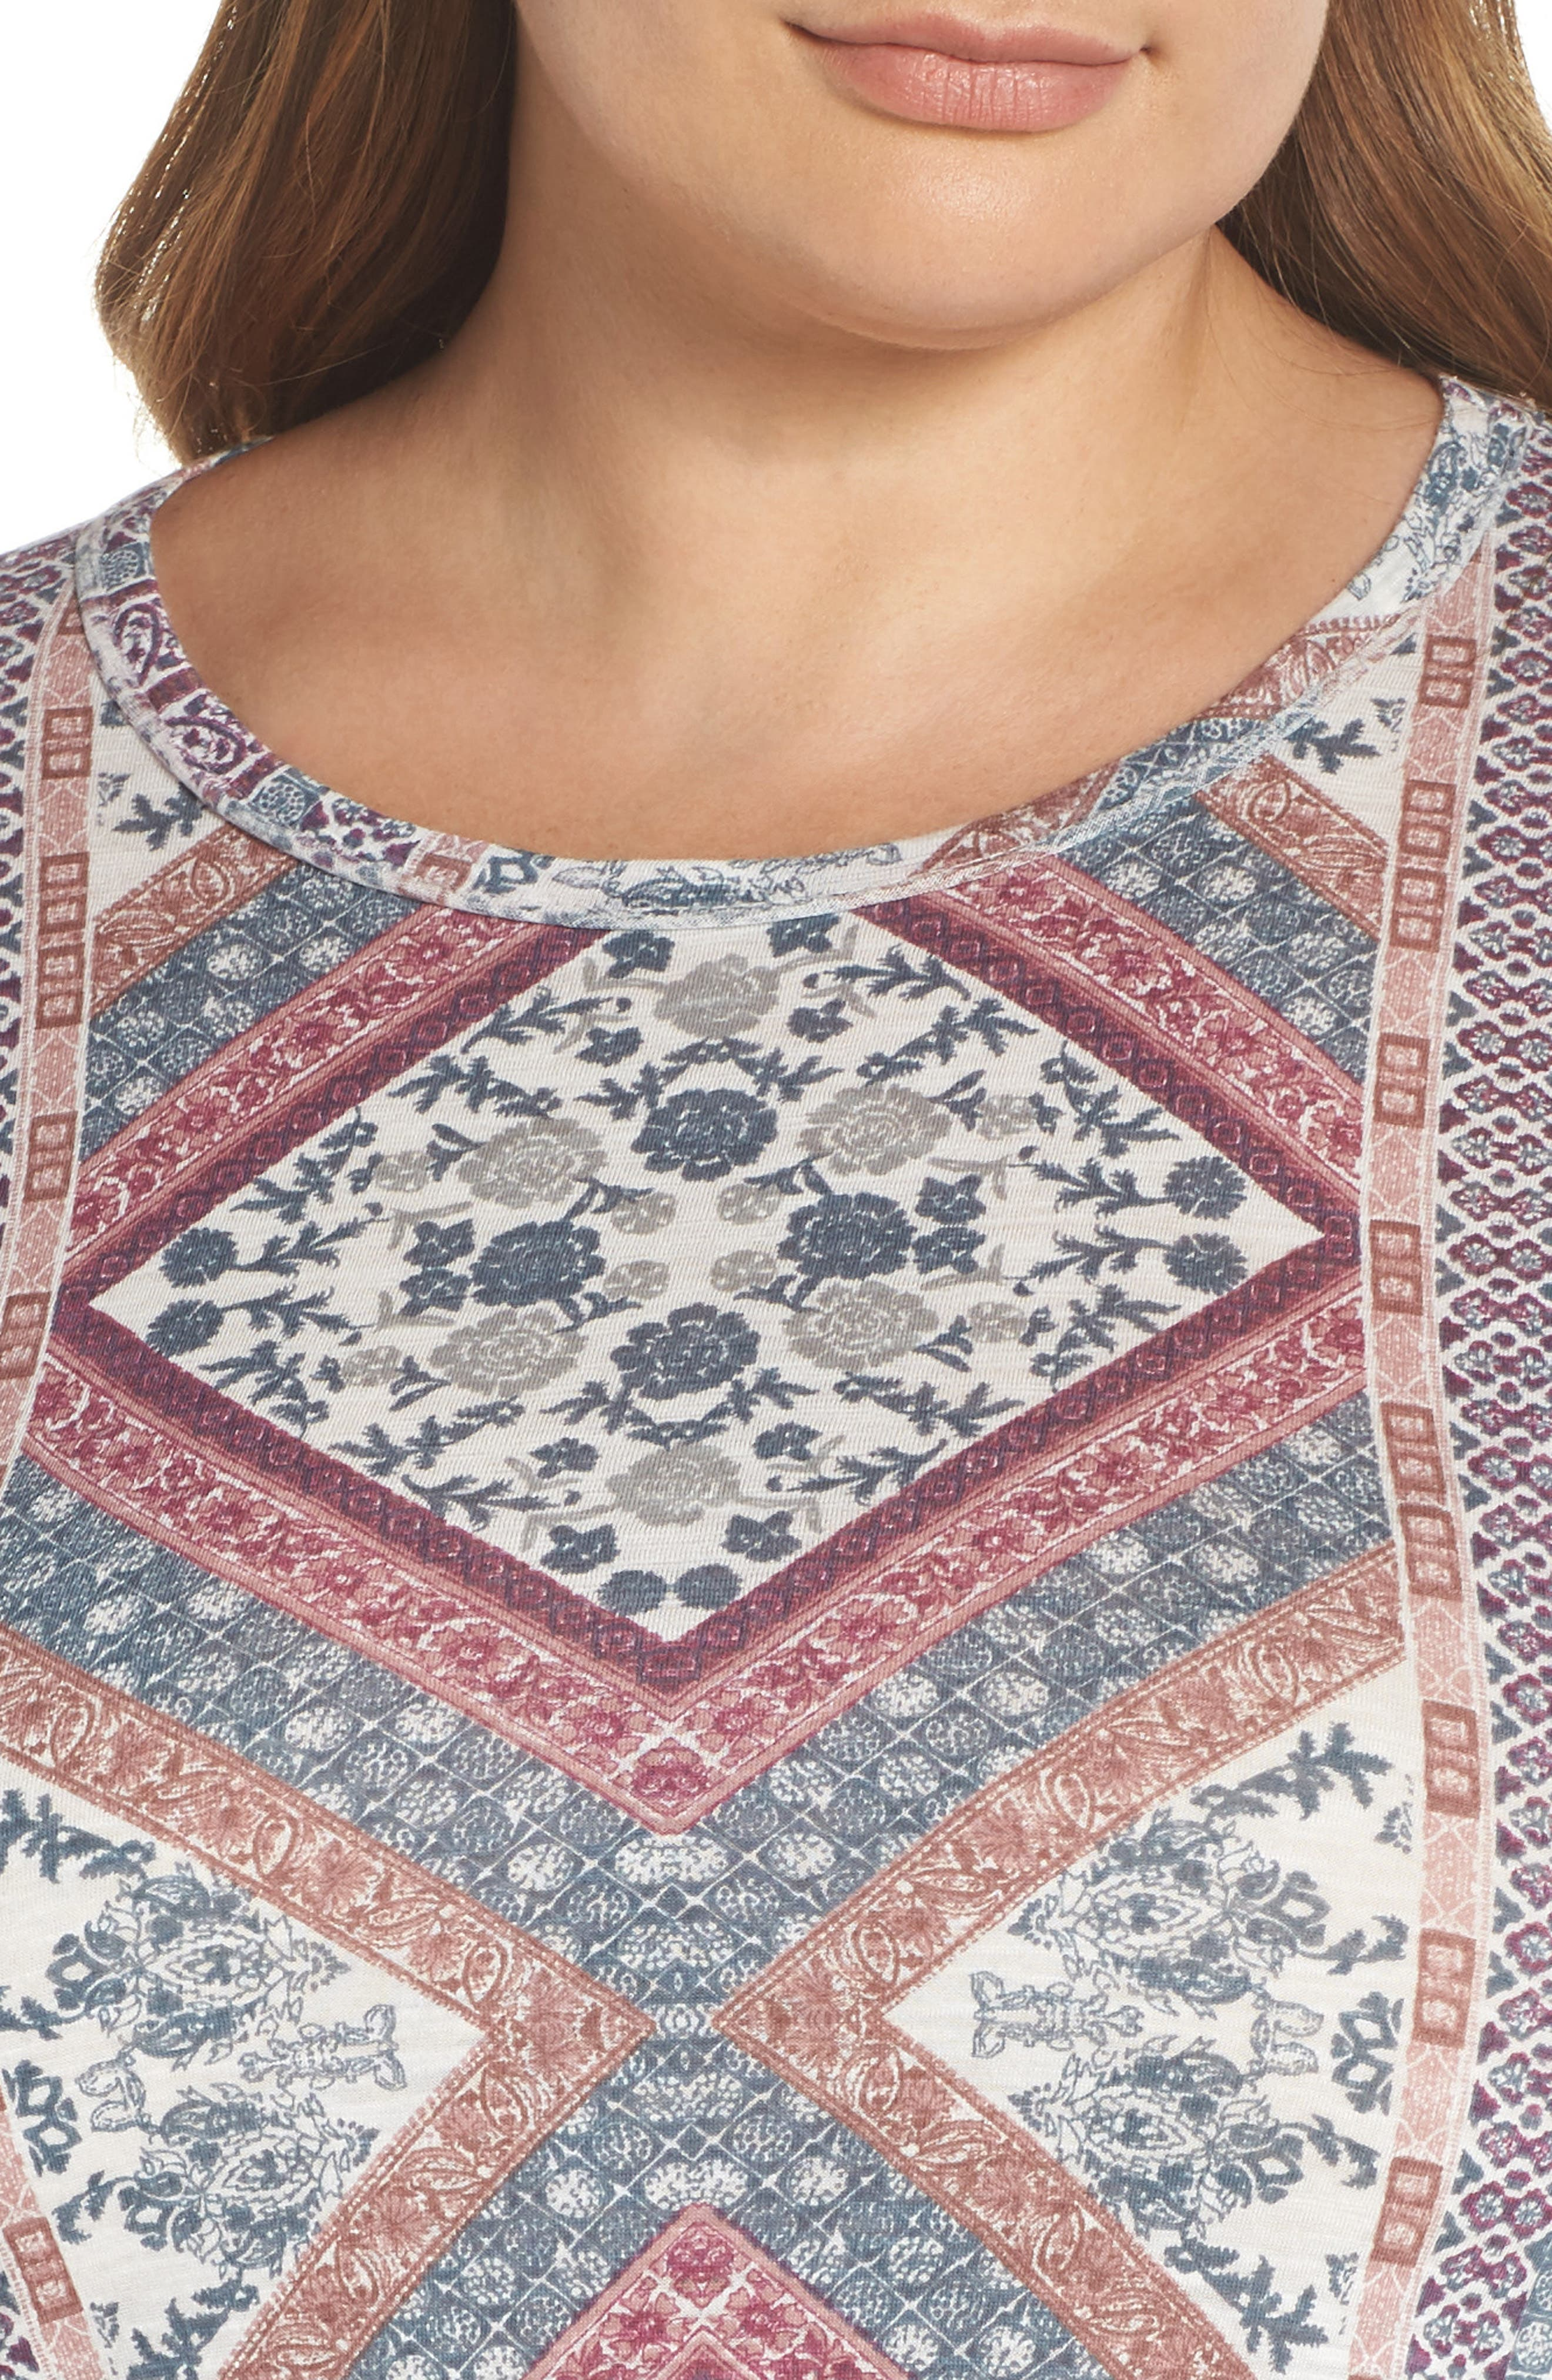 Tapestry Blouse,                             Alternate thumbnail 4, color,                             430